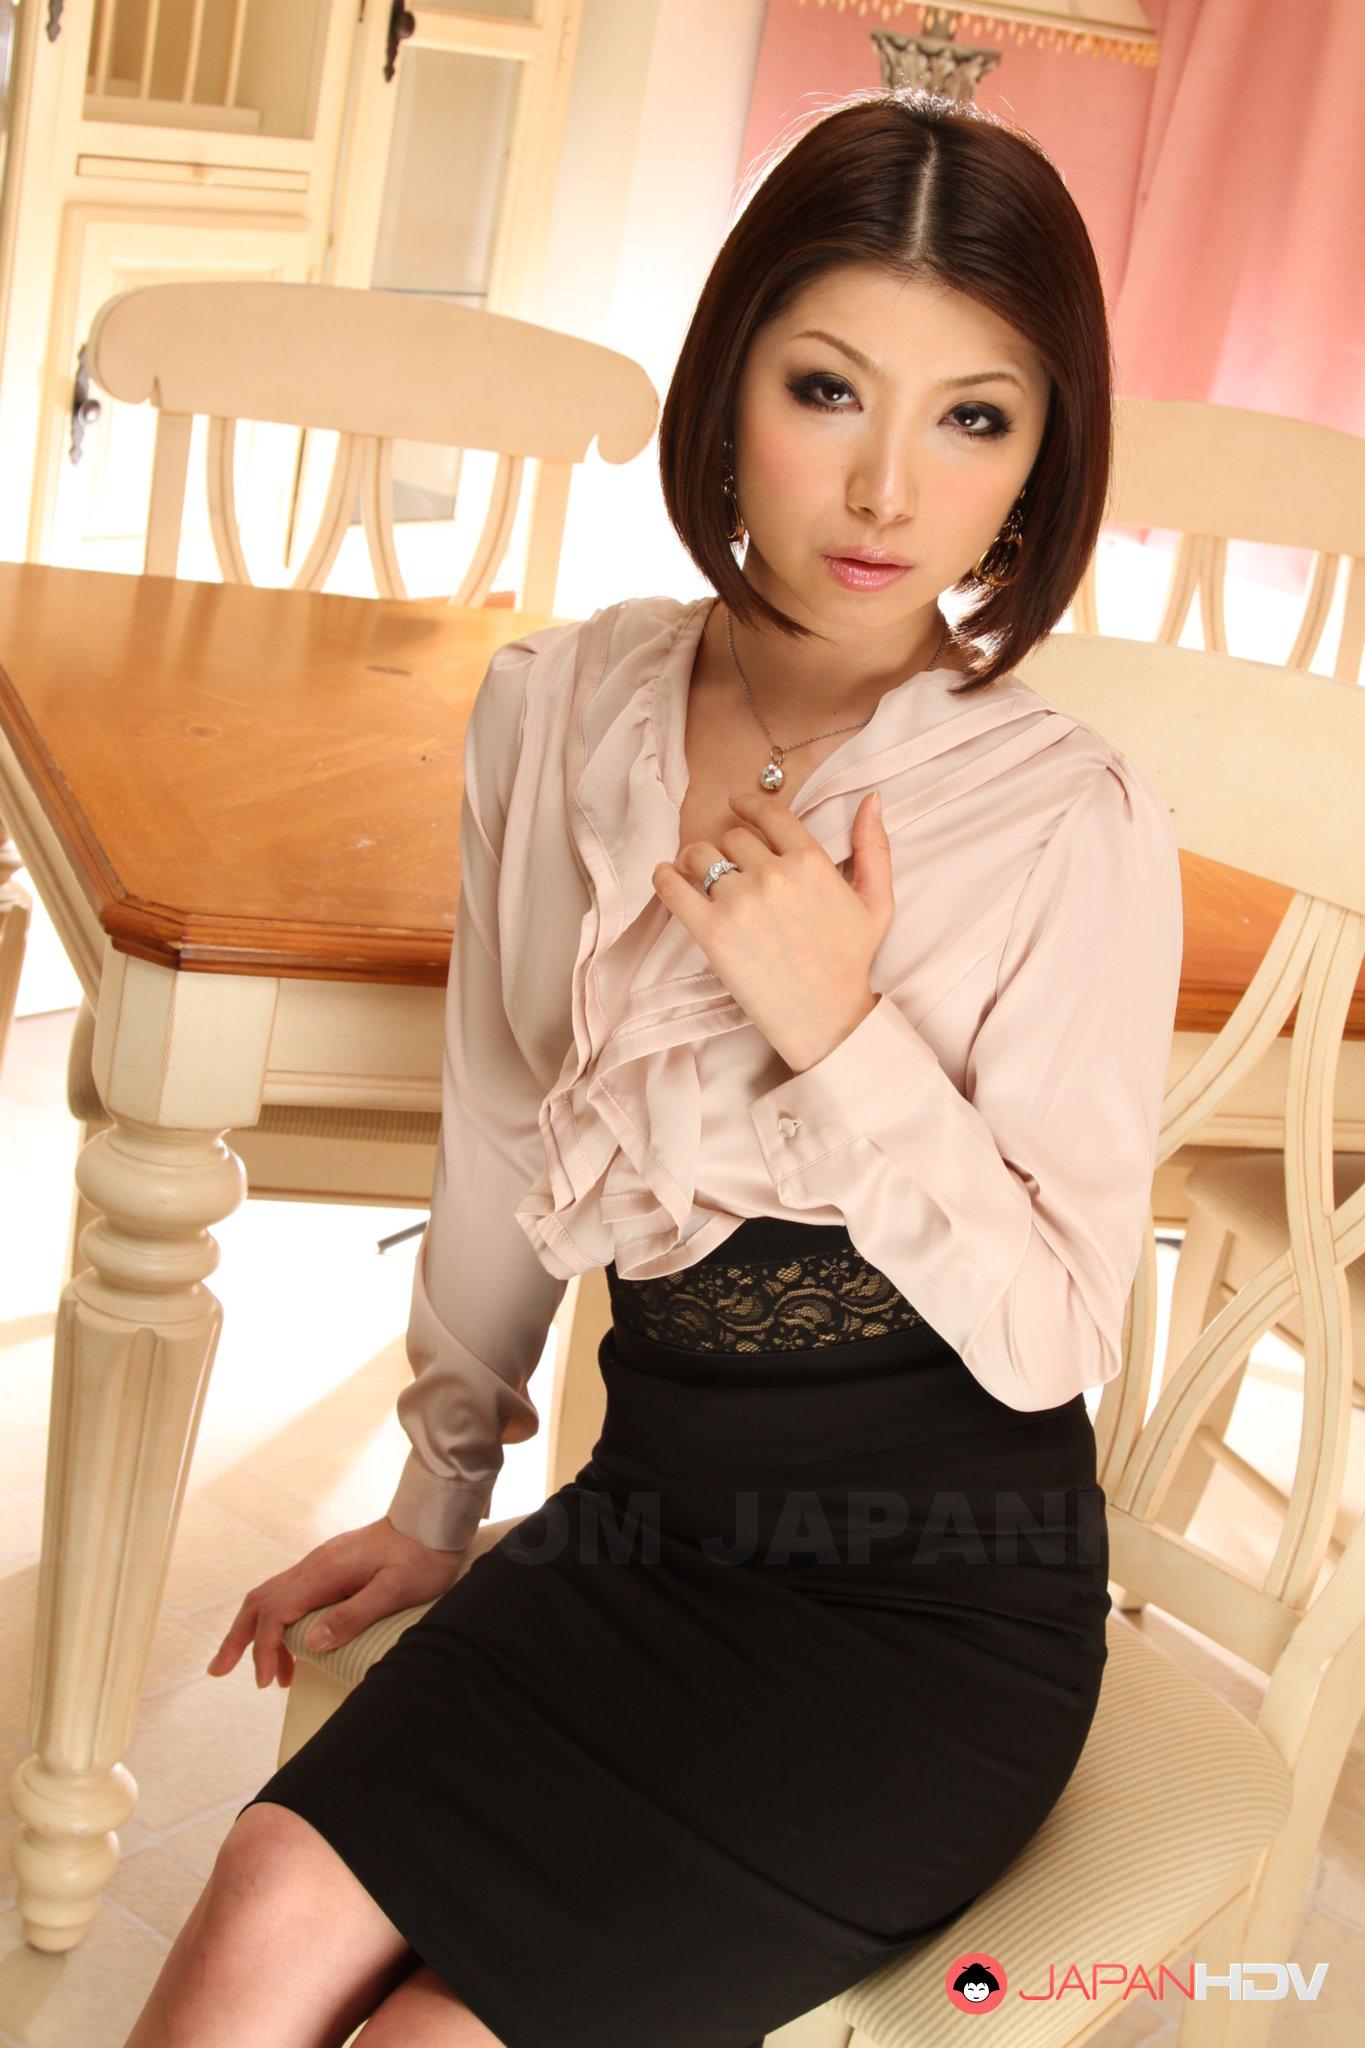 Classy Japanese - This classy Japanese porn lady Tsubaki is hot